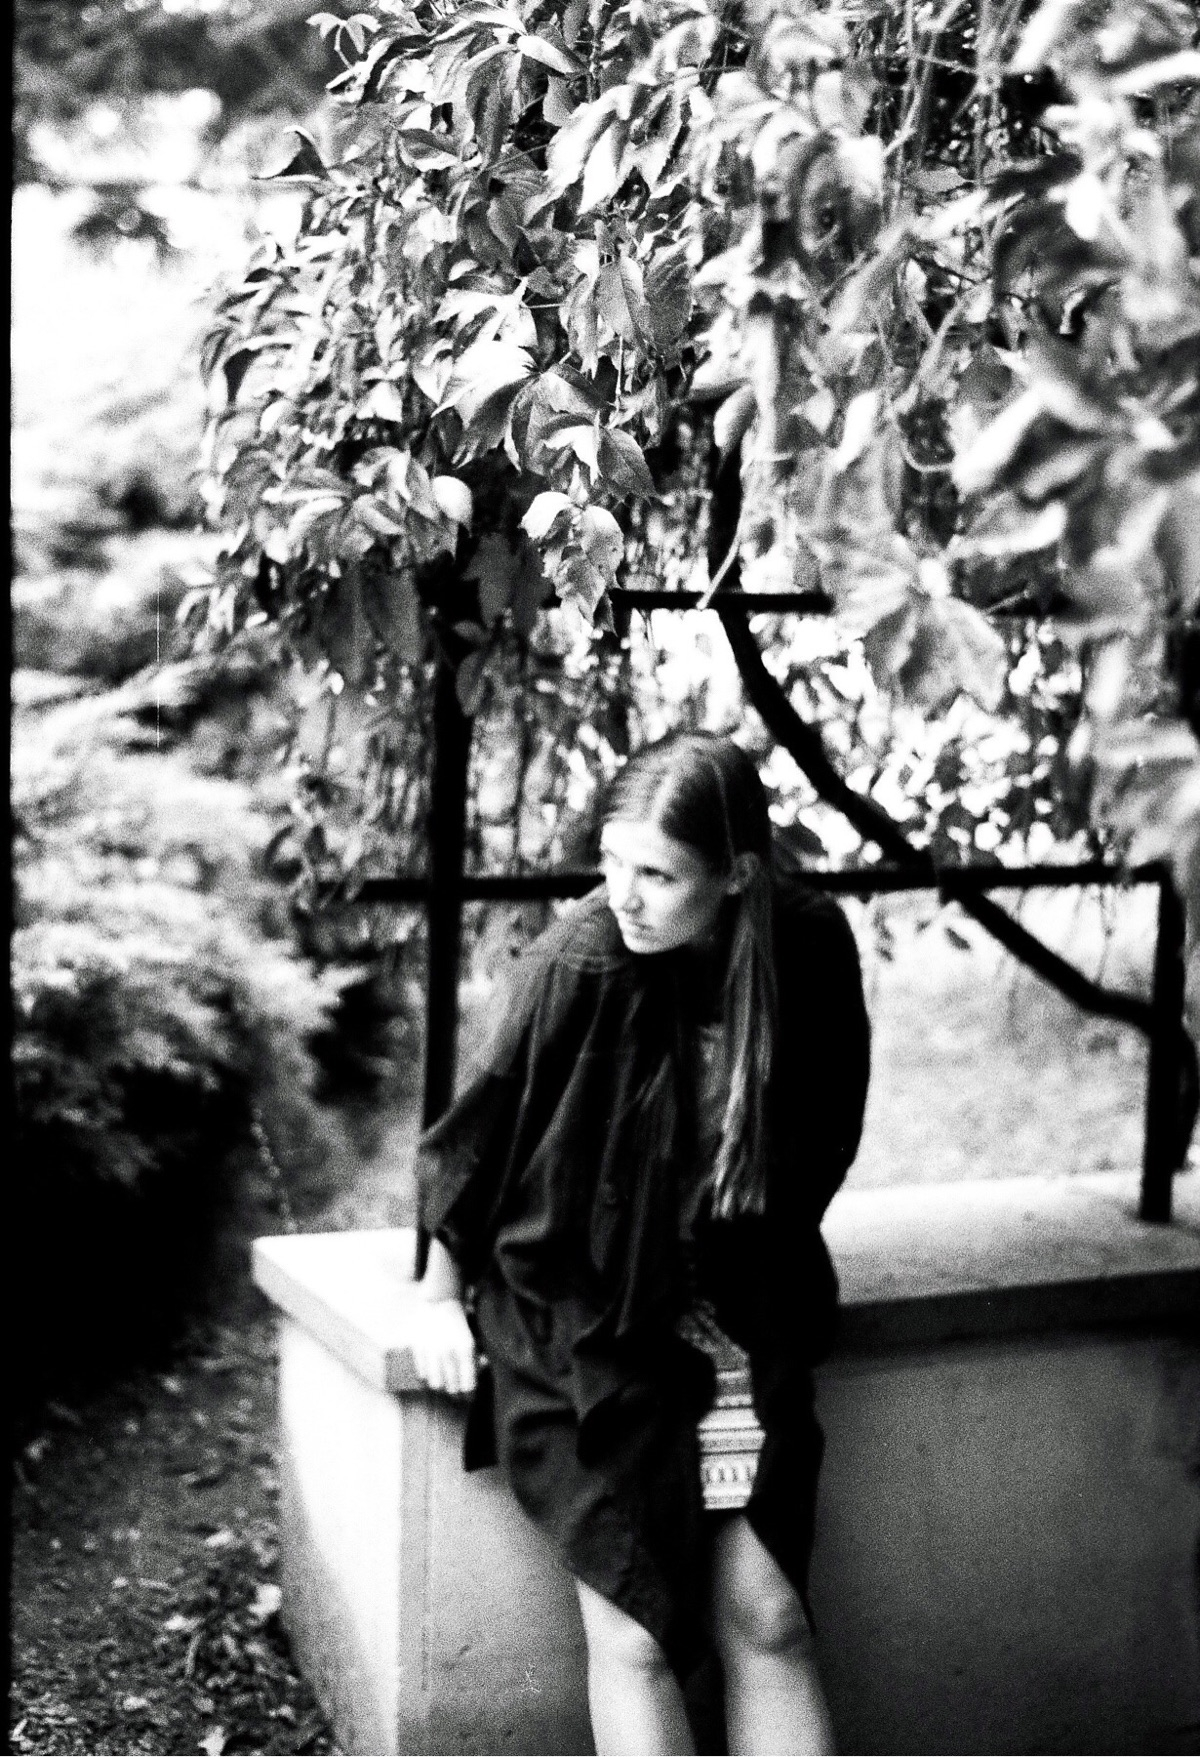 Urszula - analog, film, 35mm, photography - tatao | ello